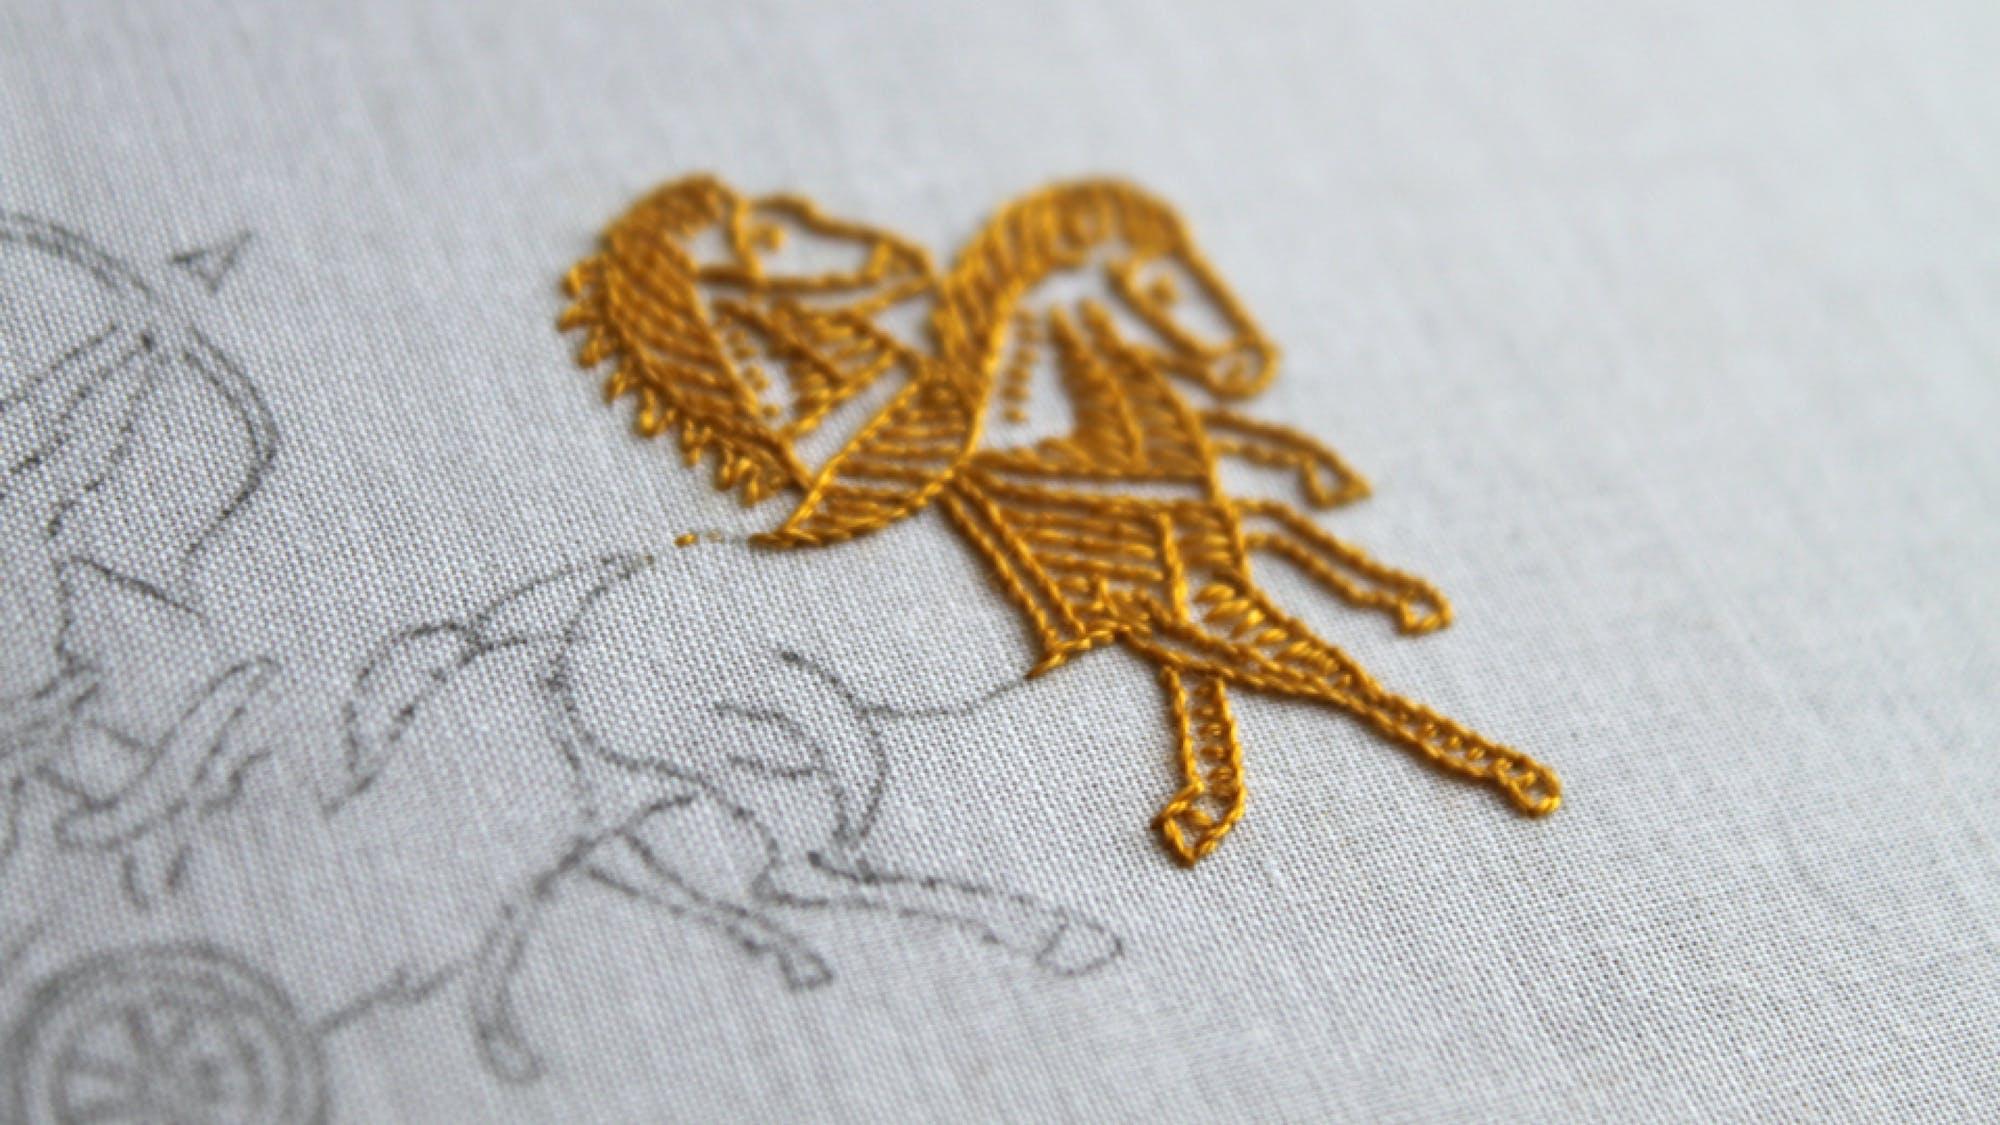 Walpole Editorial The Value of Craftsmanship Part 3:Hawthorne & Heaney by Lisa Grainger